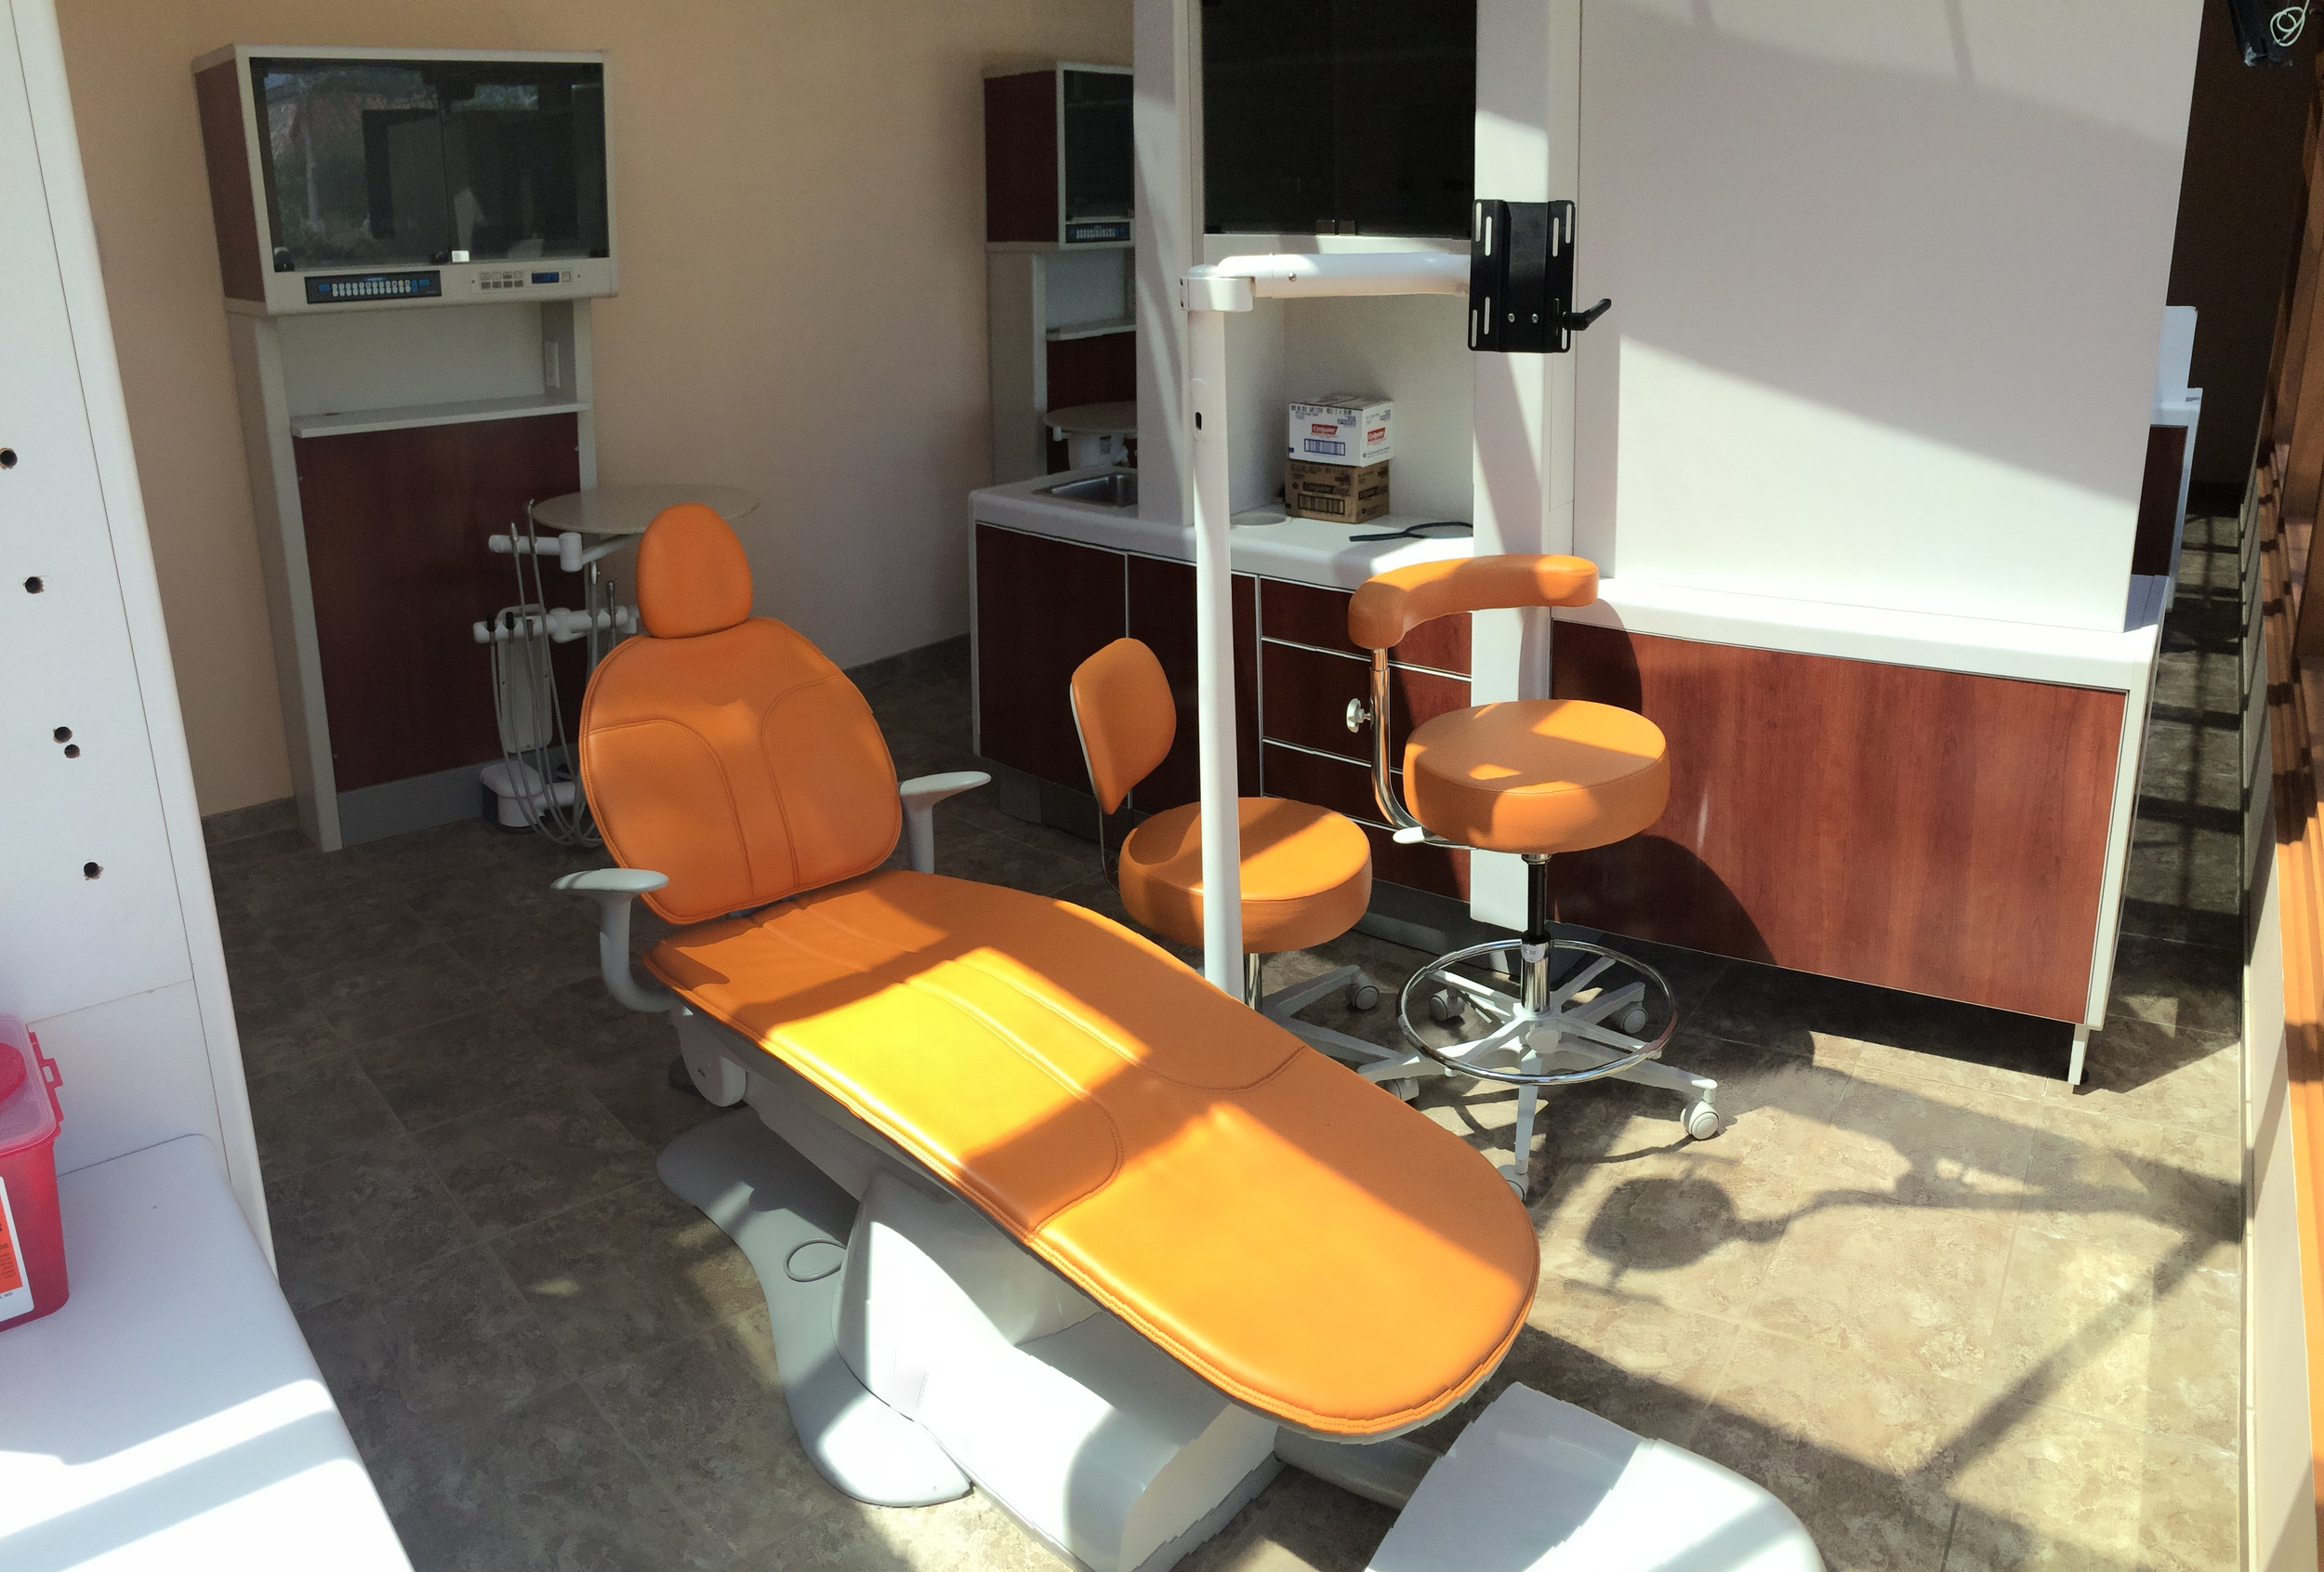 town-center-dentistry-san-diego-rancho-bernardo-teeth-tooth-dentist-dental